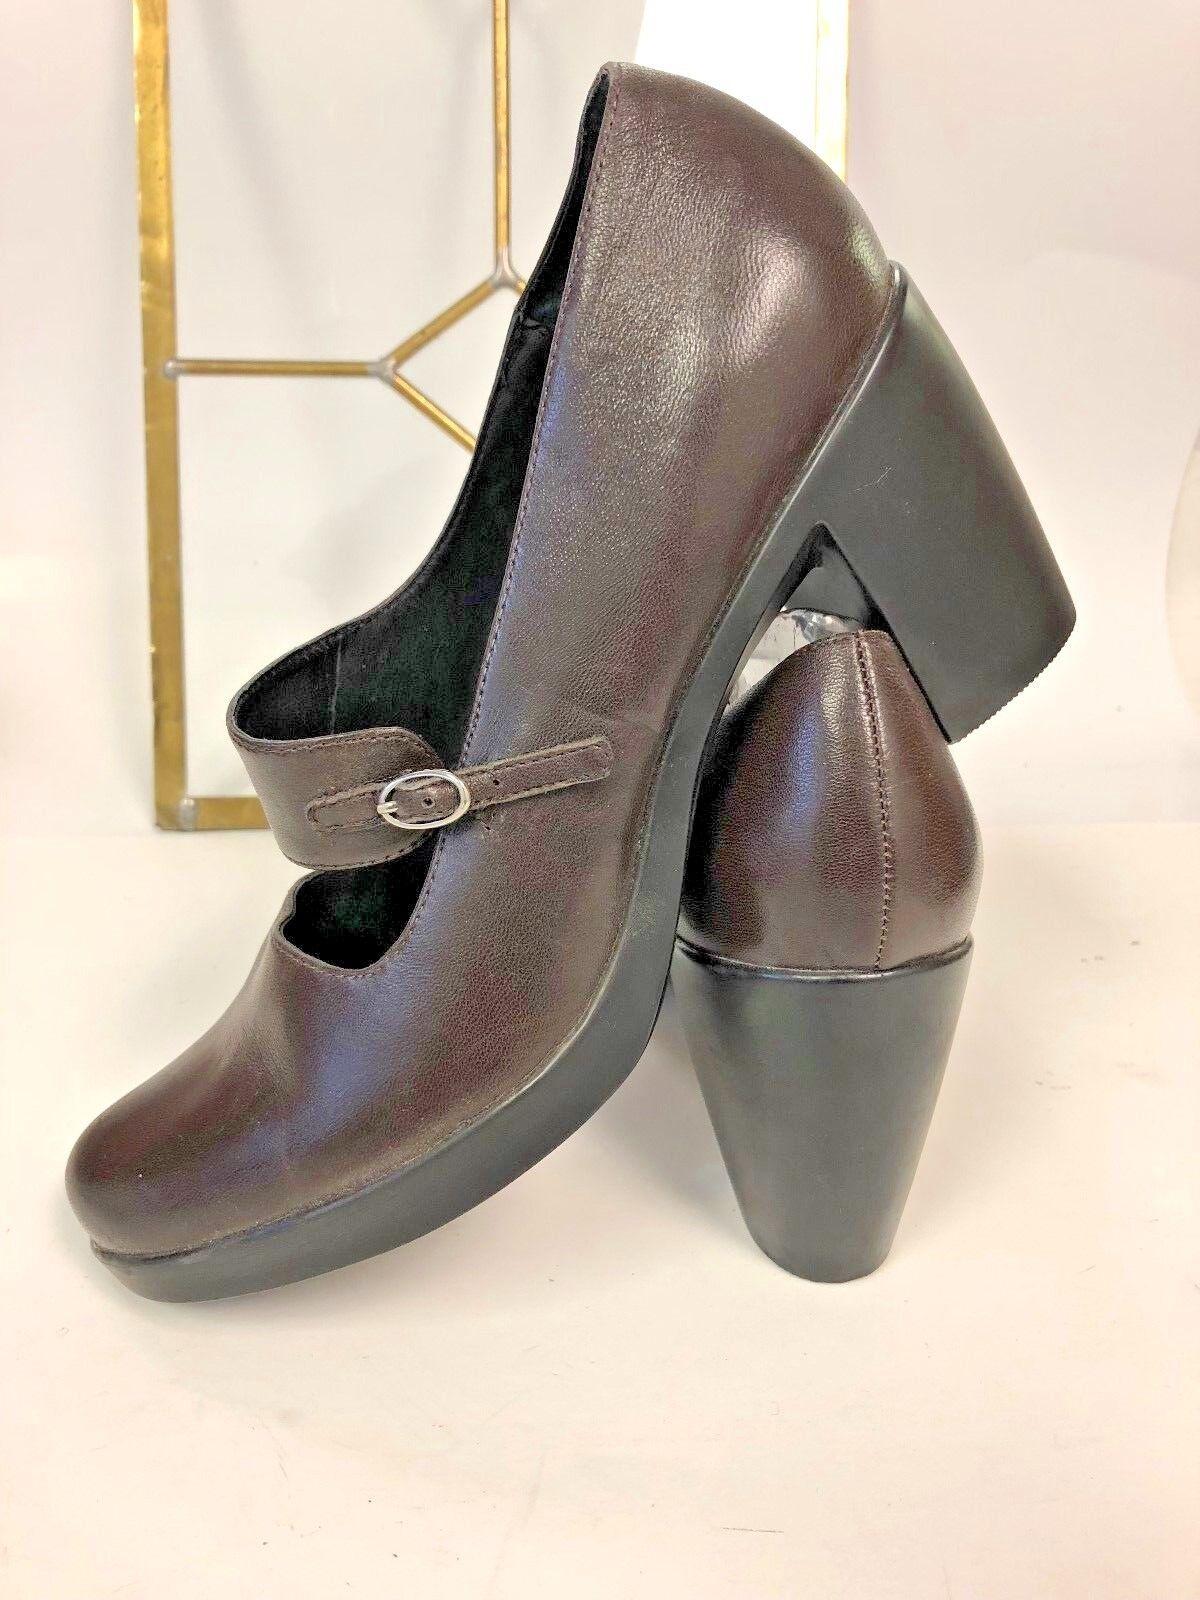 Dansko Womens 41 EU 10.5-11US Brown Leather Mary Janes 3.5  Heels shoes Pumps